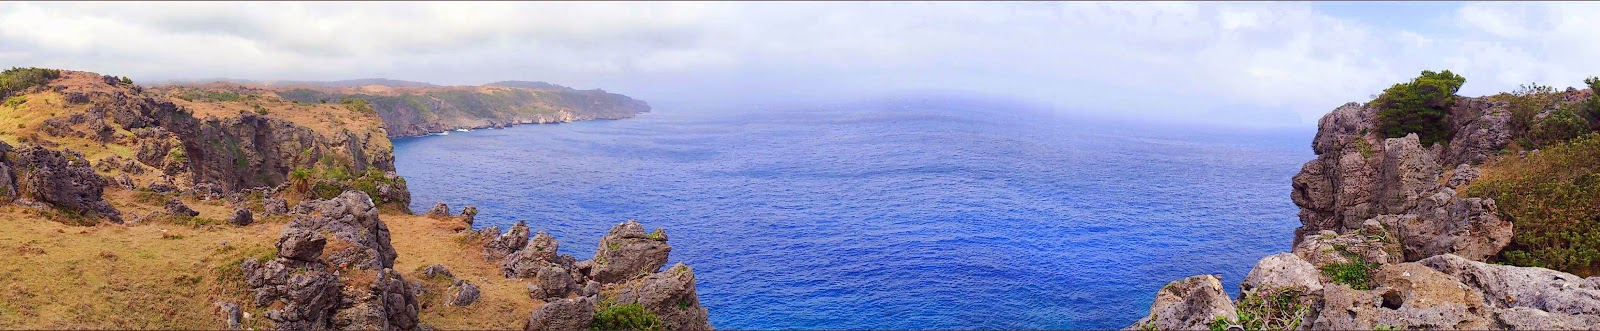 Torongan Cliff, Itbayat, Batanes